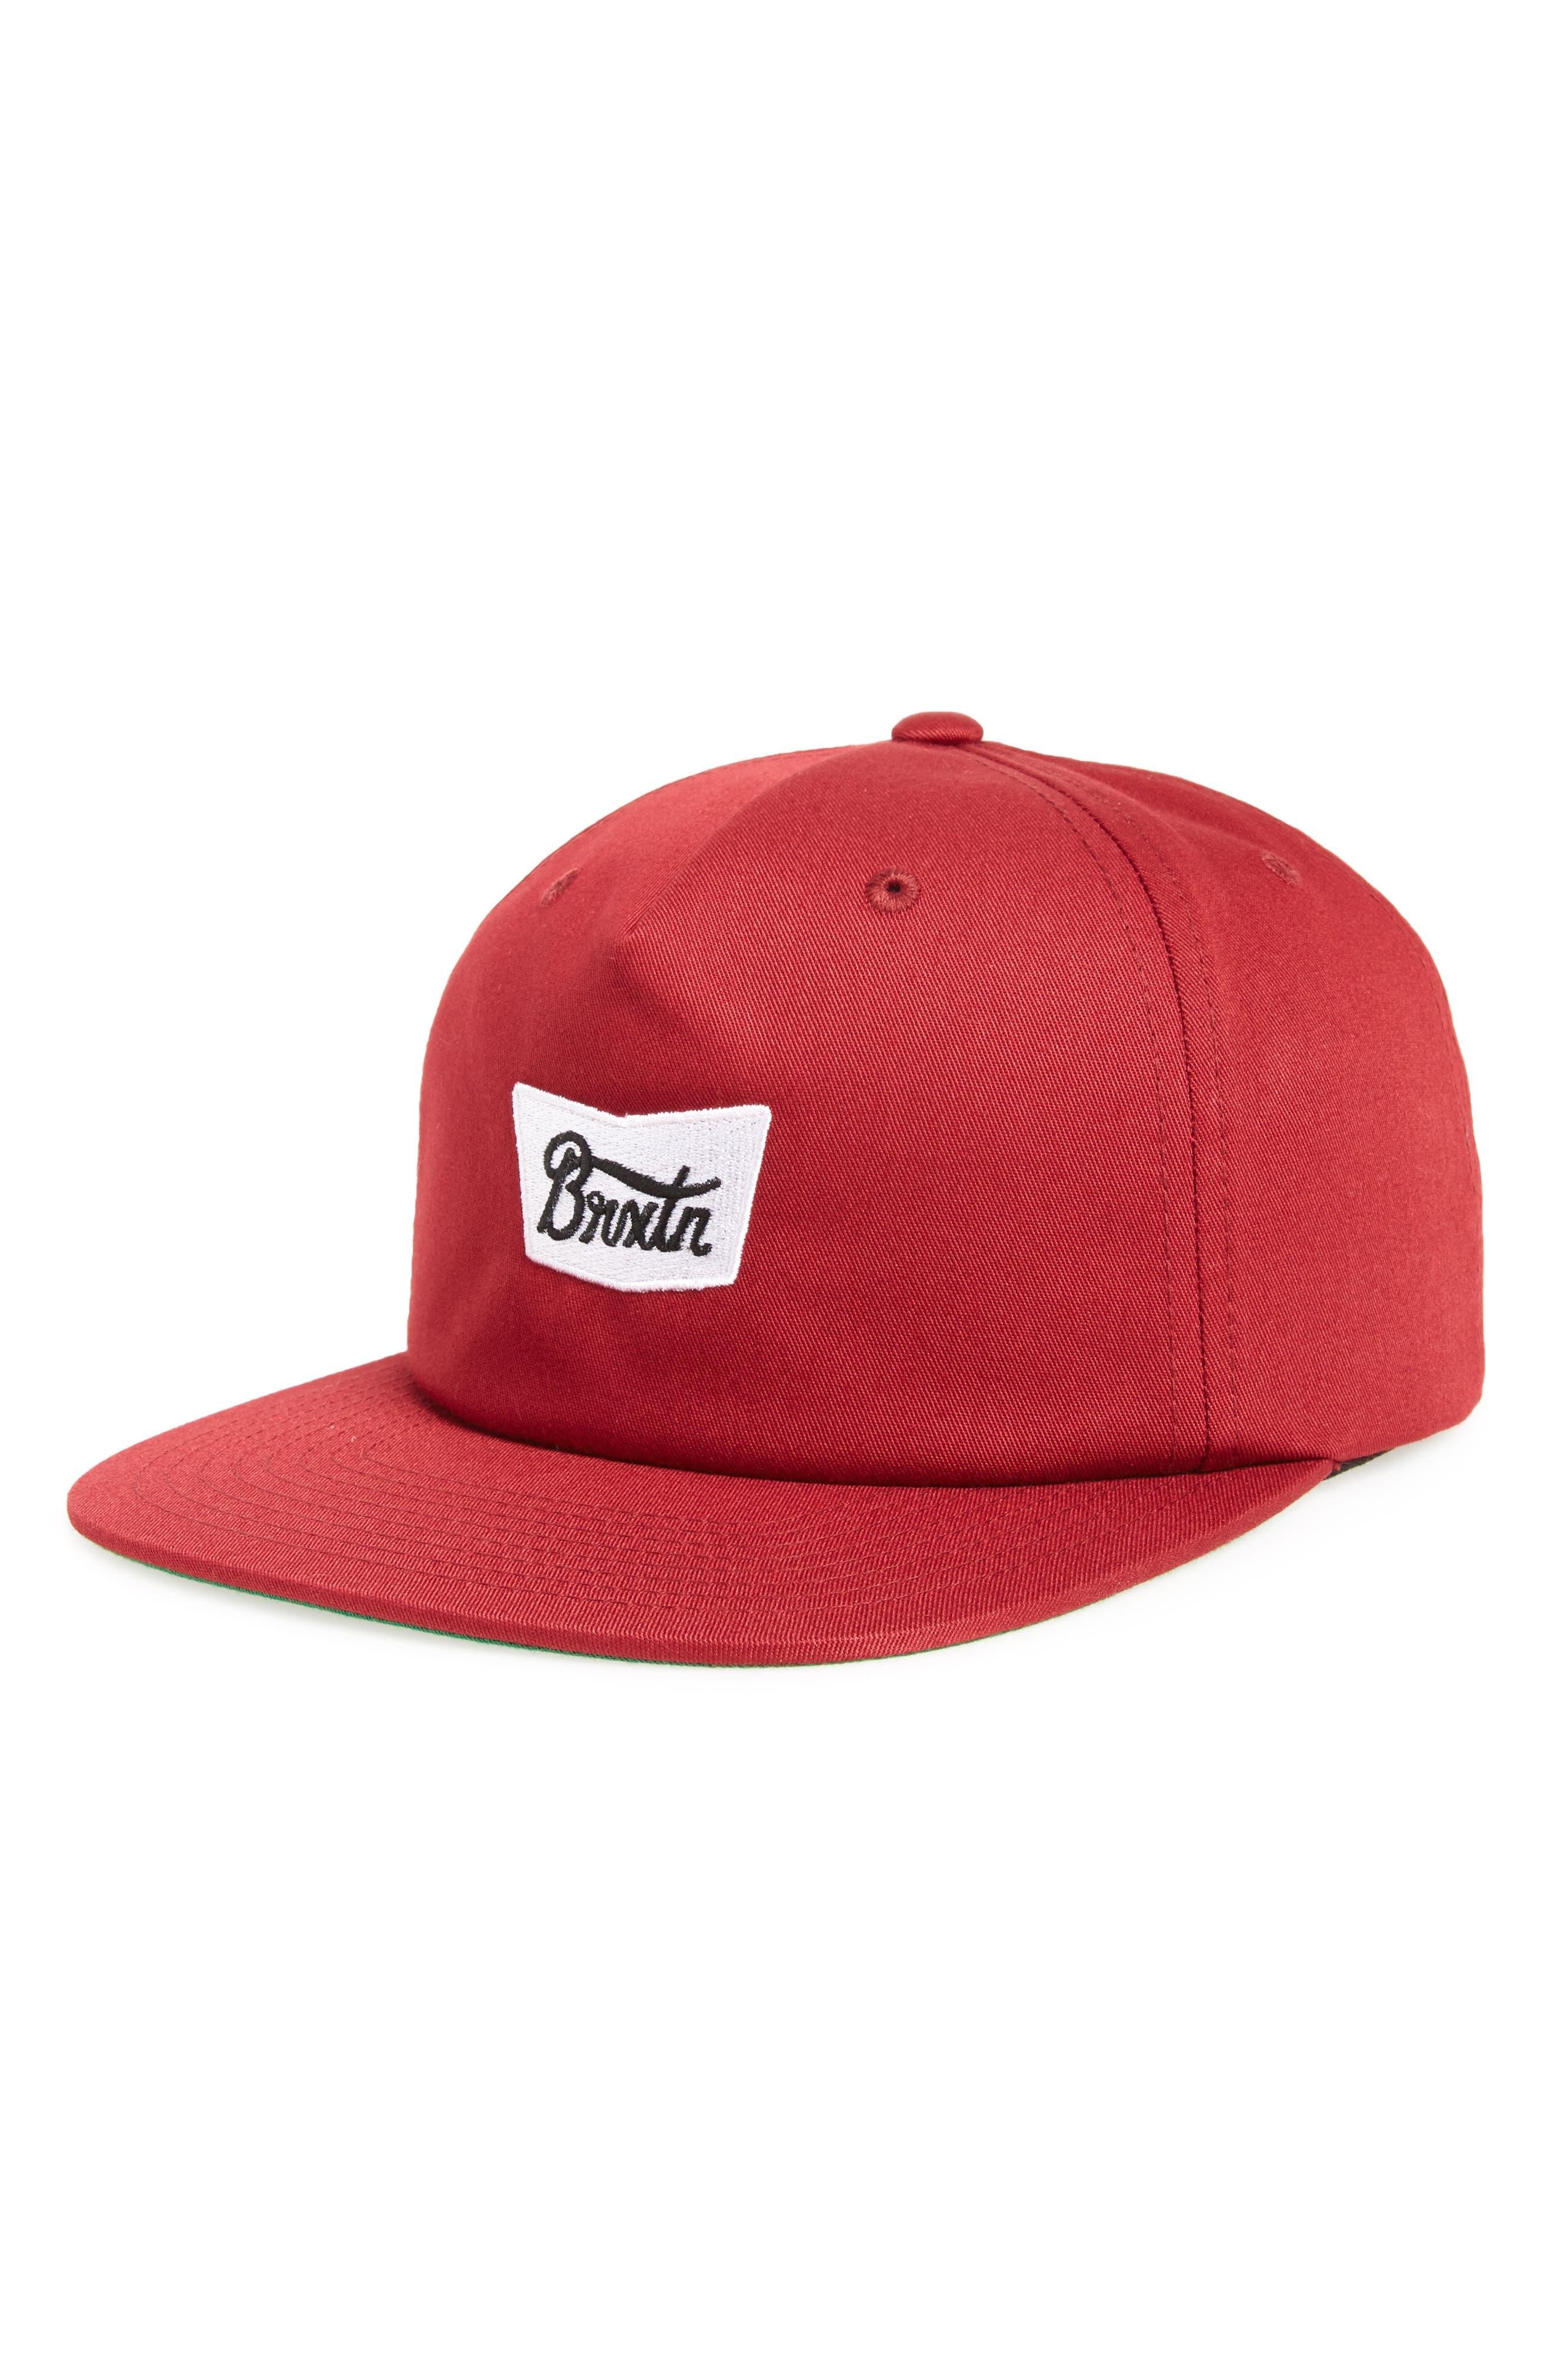 Alternate Image 1 Selected - Brixton Snapback Baseball Cap